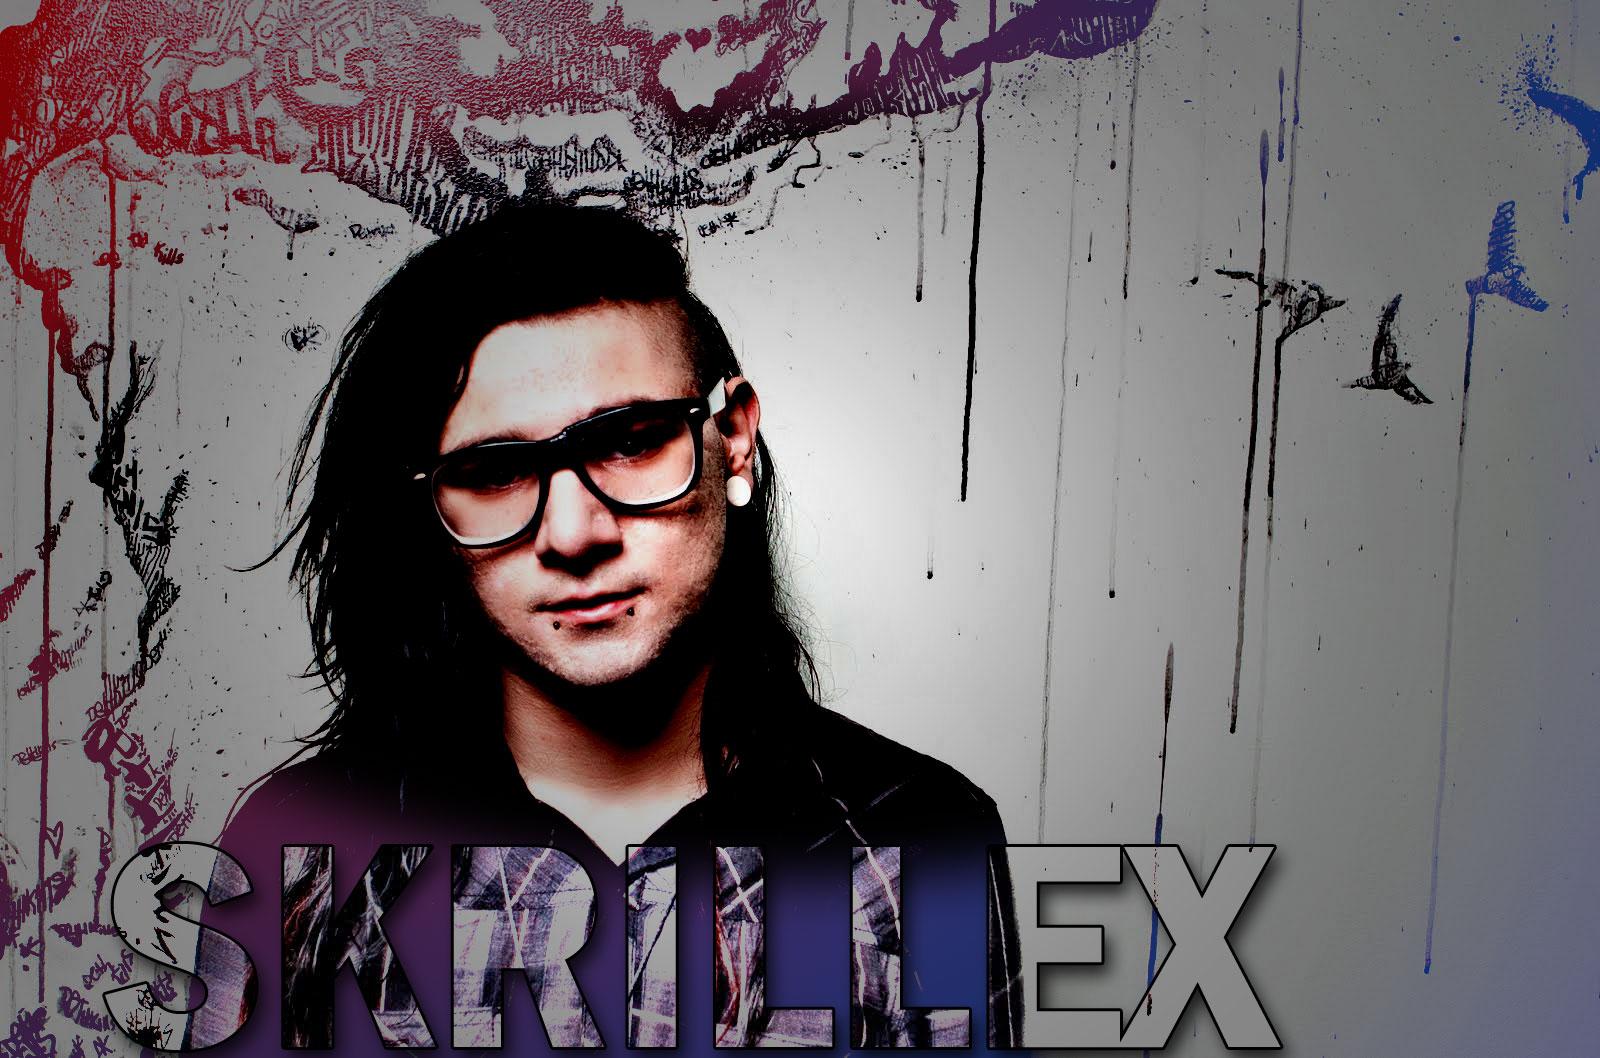 Dubstep Music Skrillex Trance 1600x1058